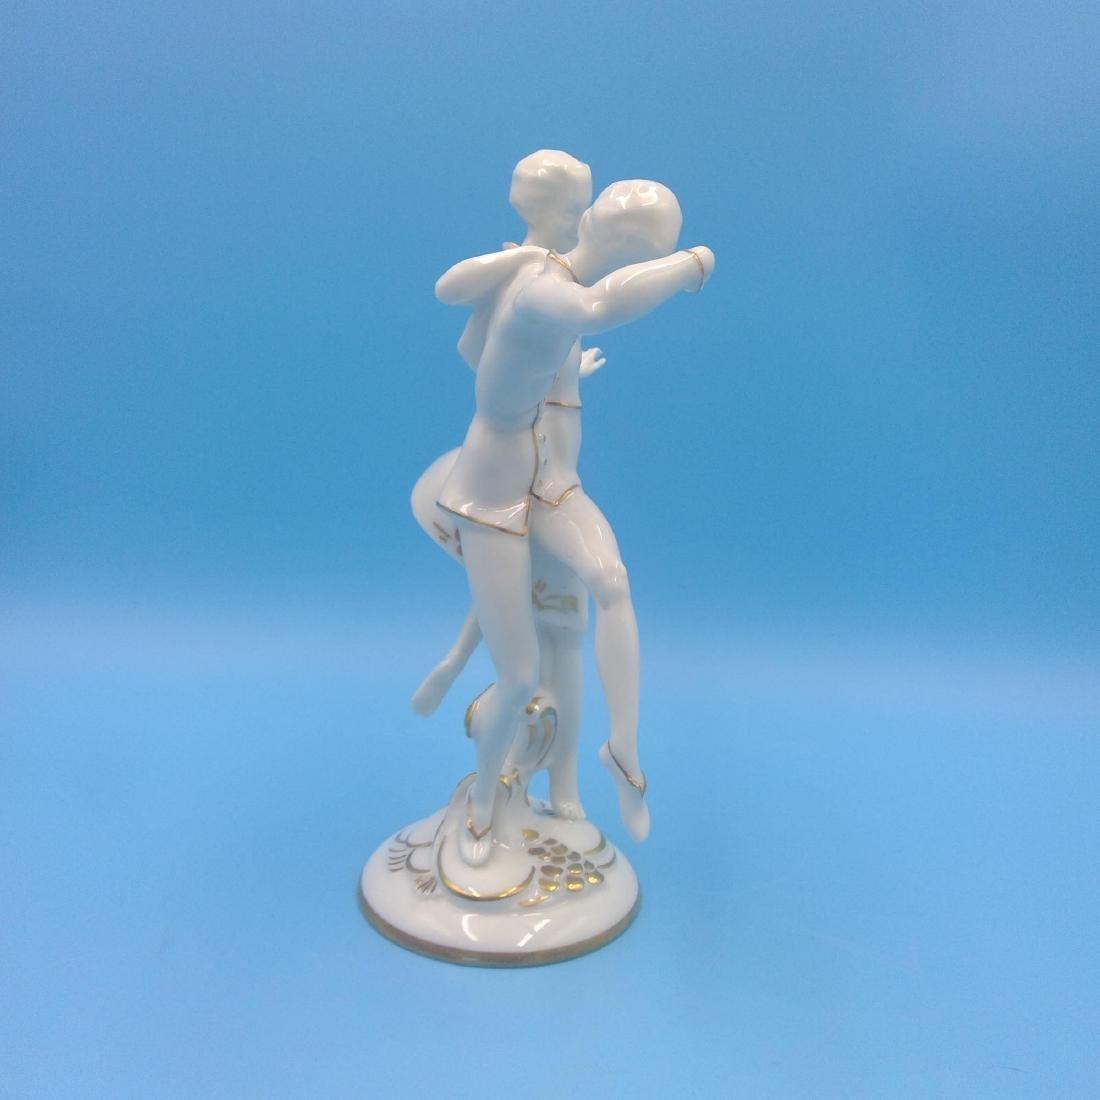 HUTSCHENREUTHER GERMAN PORCELAIN FIGURINE DANCERS - 4